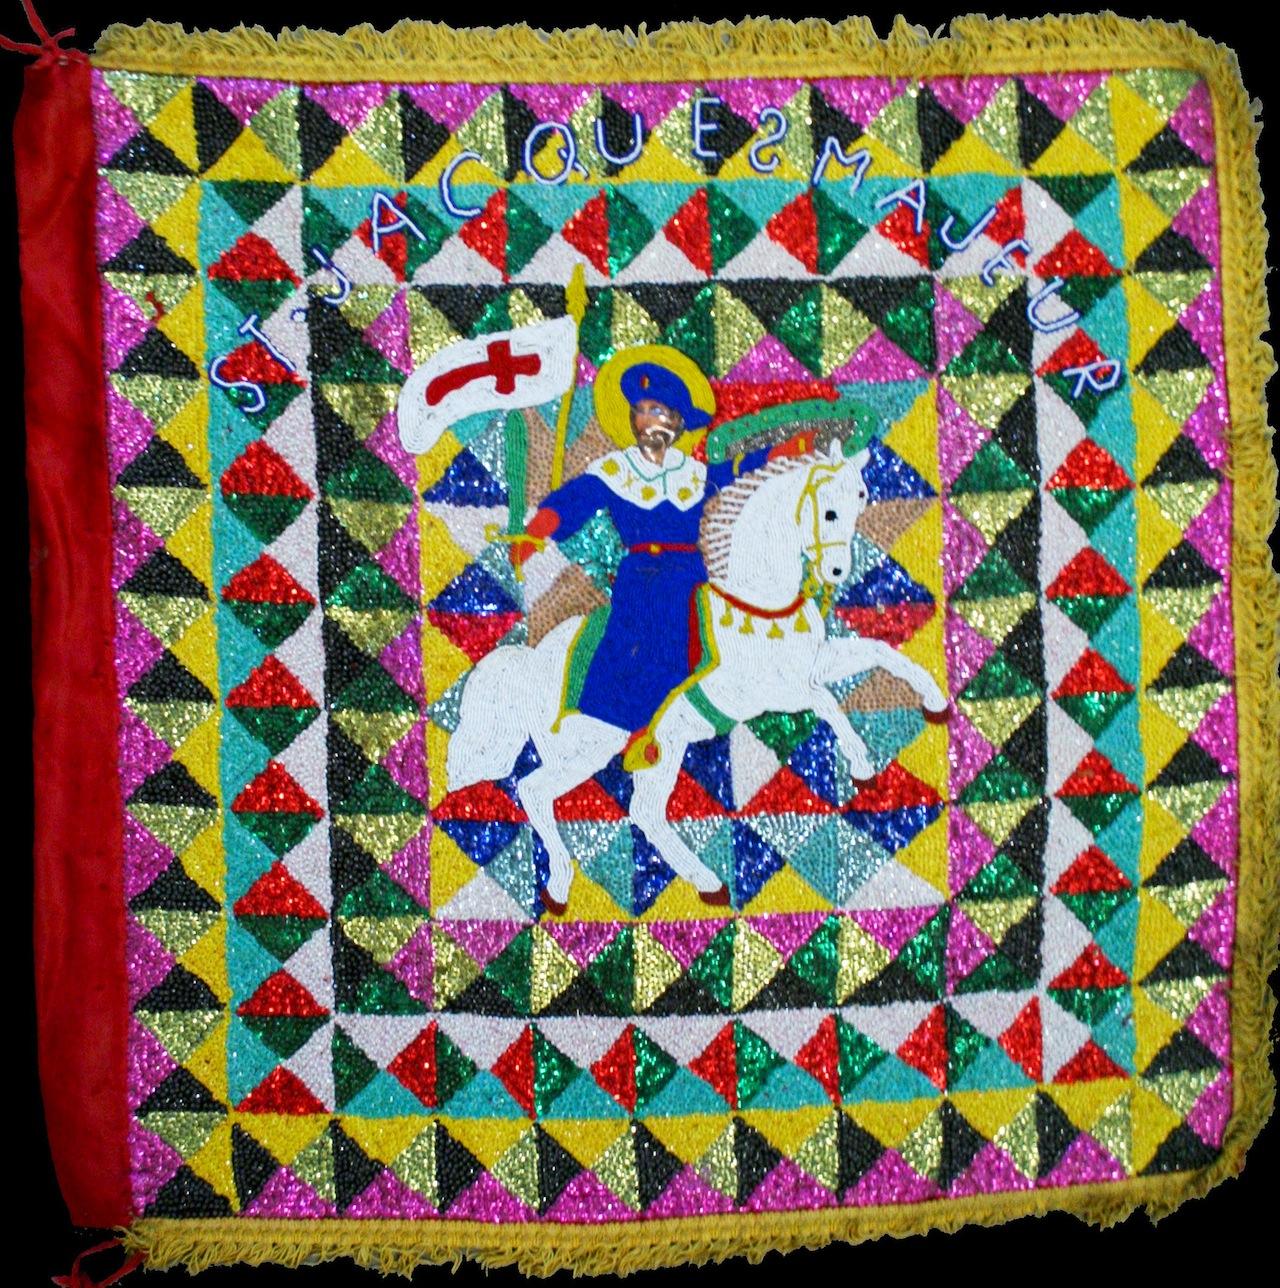 Ogoun (Rada) d Mid 20th century Plastic, satin, sequins, beads, burlap, thread, cotton, and fringe 34 x 33 1/2 x 1/2 Courtesy Thomas Schultz Collection